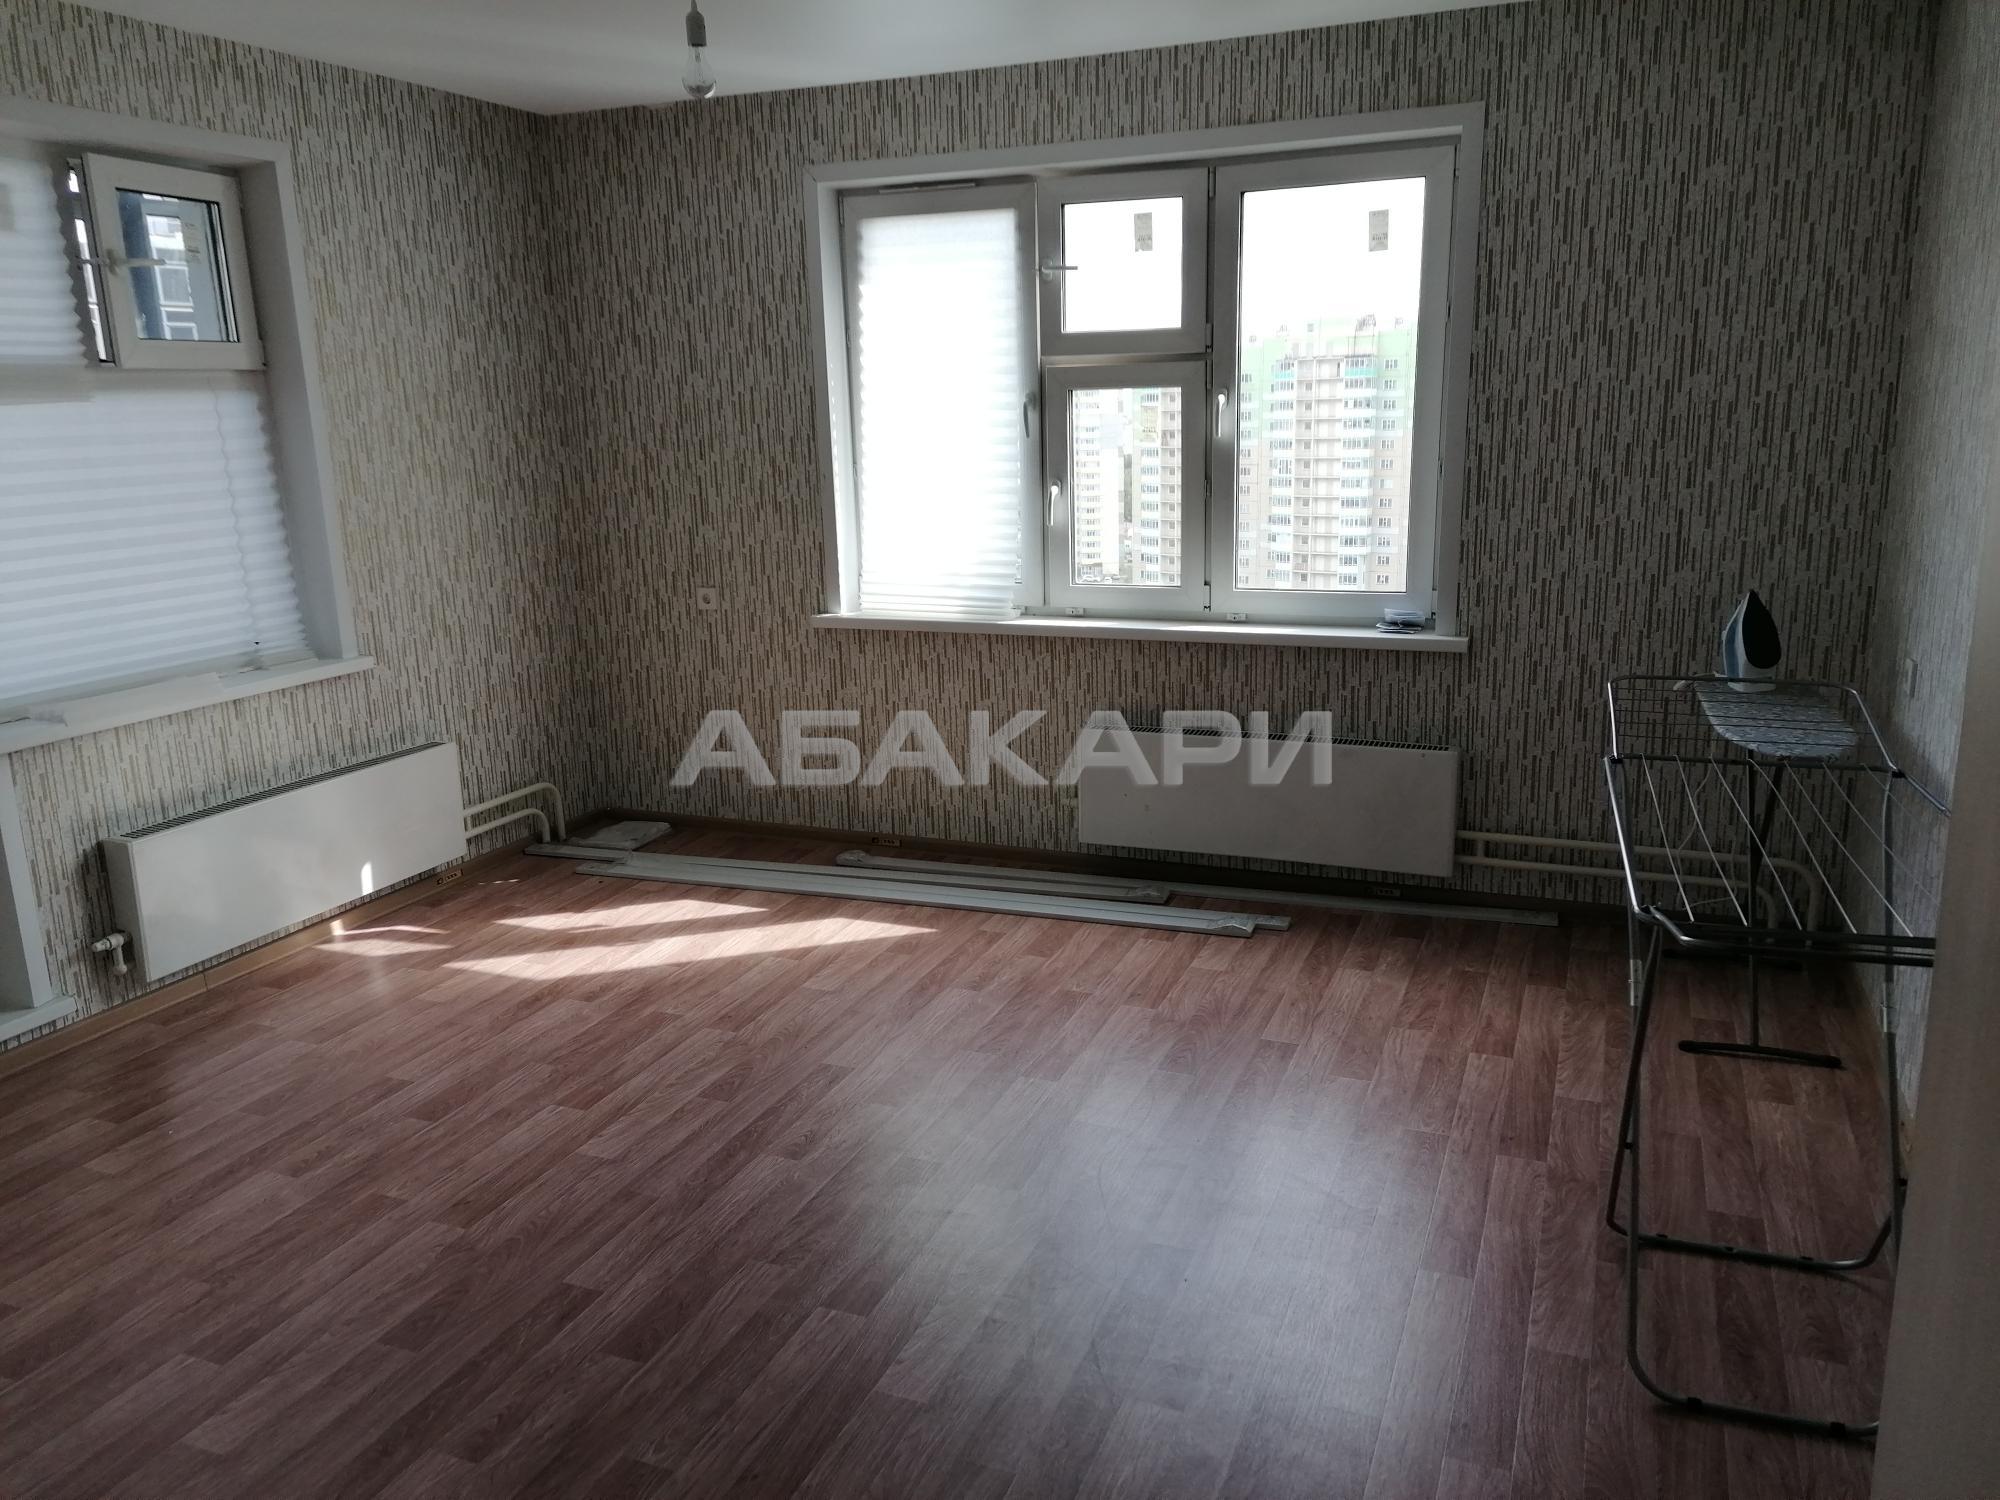 2к квартира Лесопарковая улица, 17 | 21000 | аренда в Красноярске фото 4